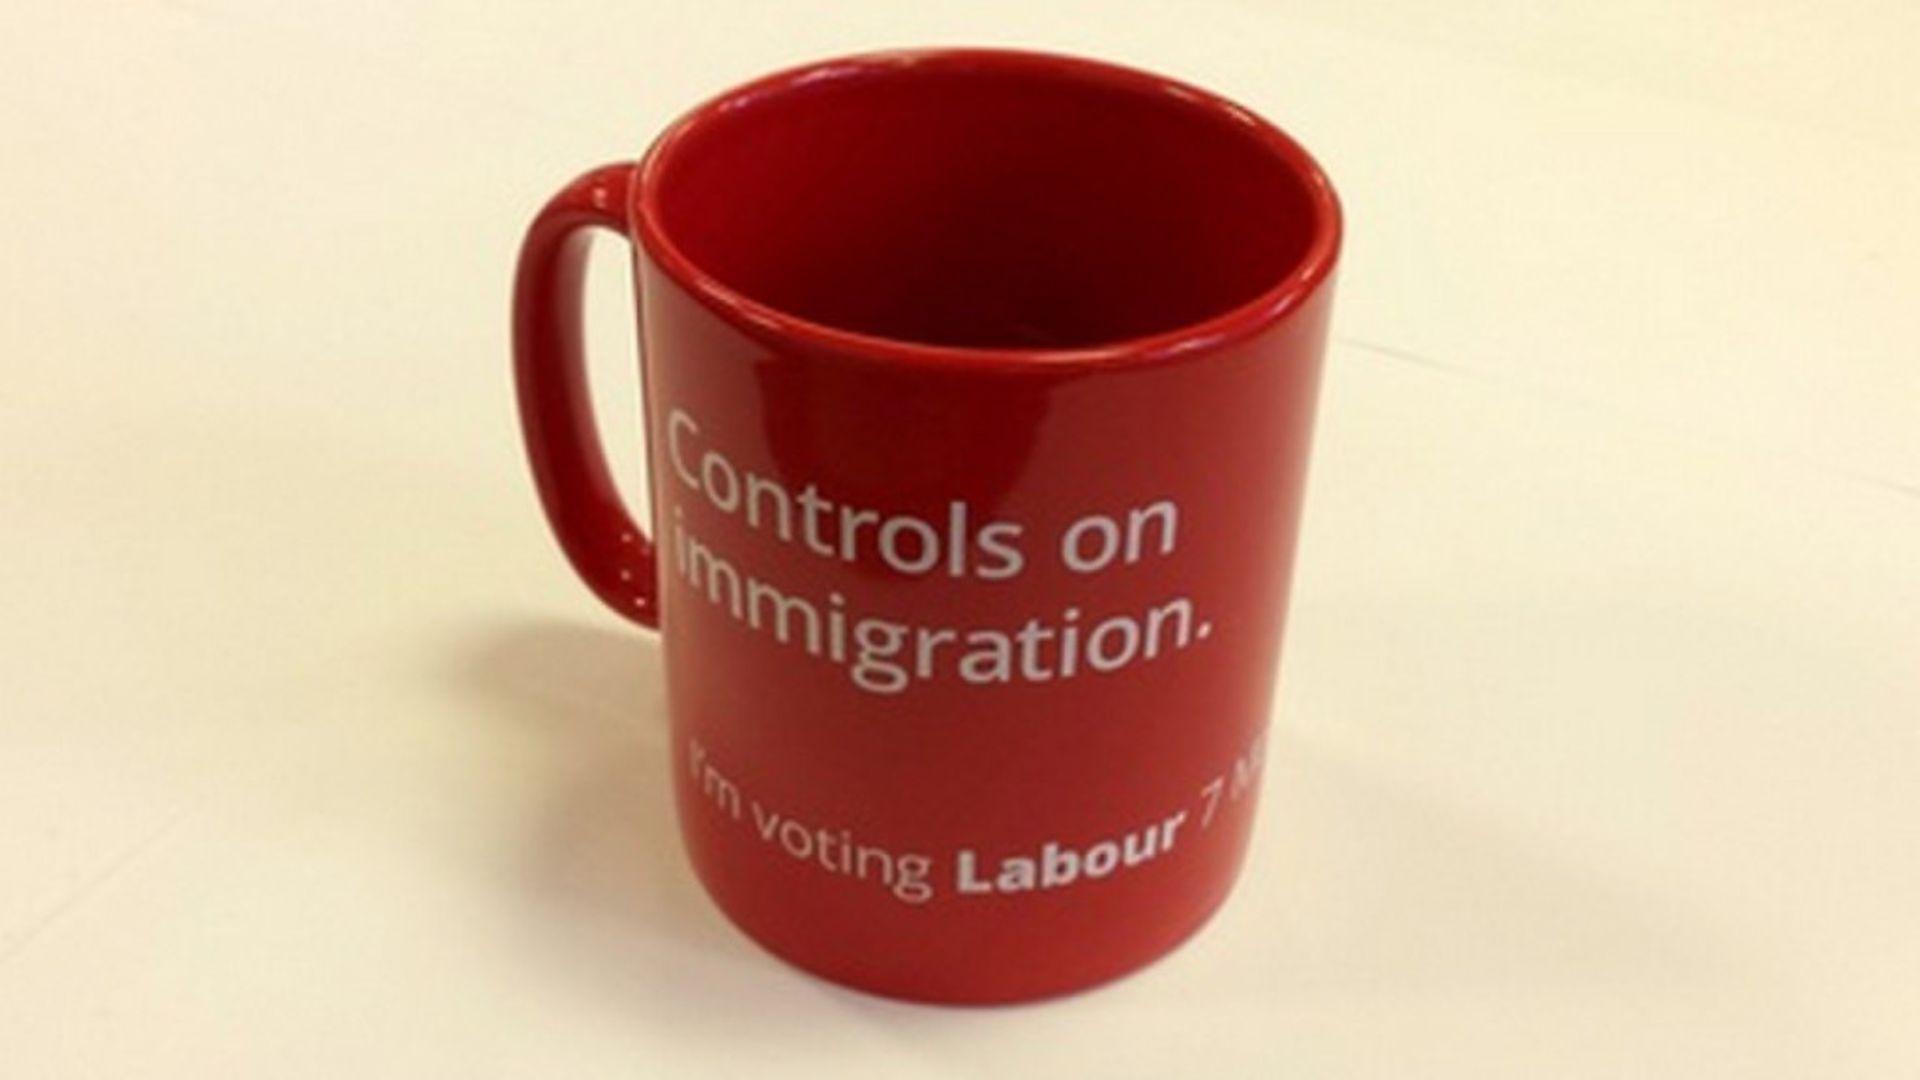 Labour's mug on immigration - Credit: Archant